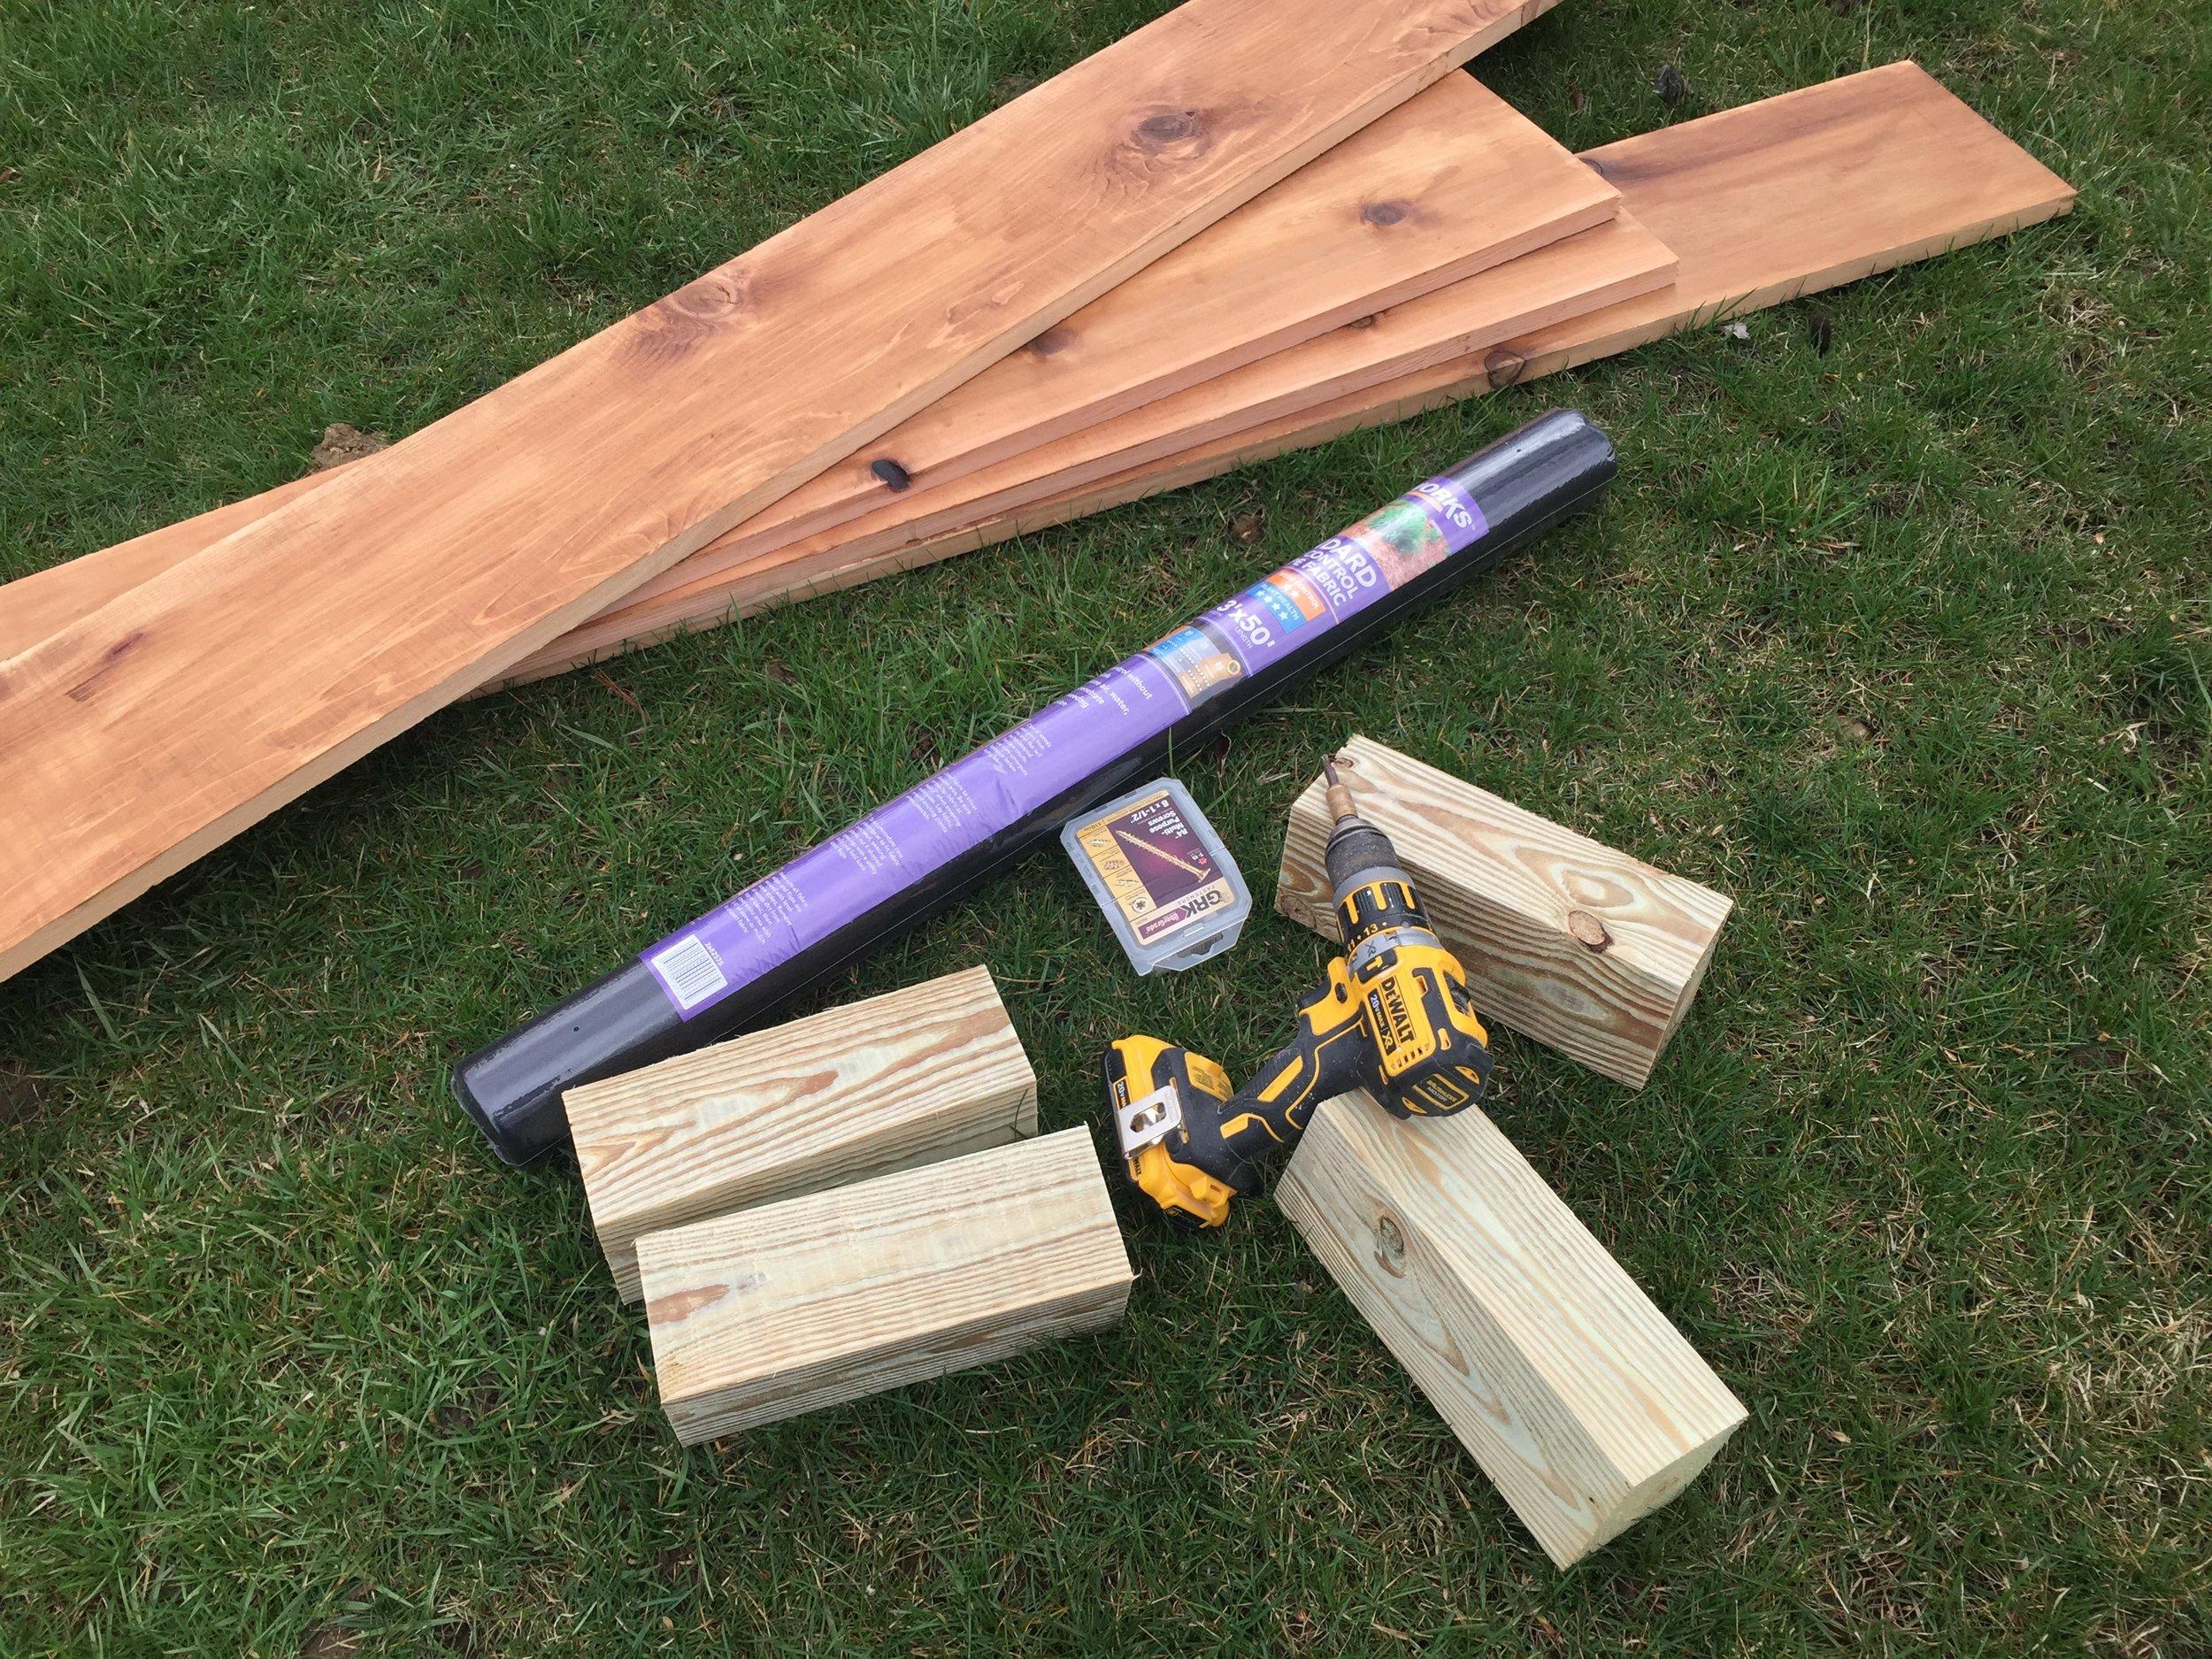 Prepped materials for installation of the cedar garden box